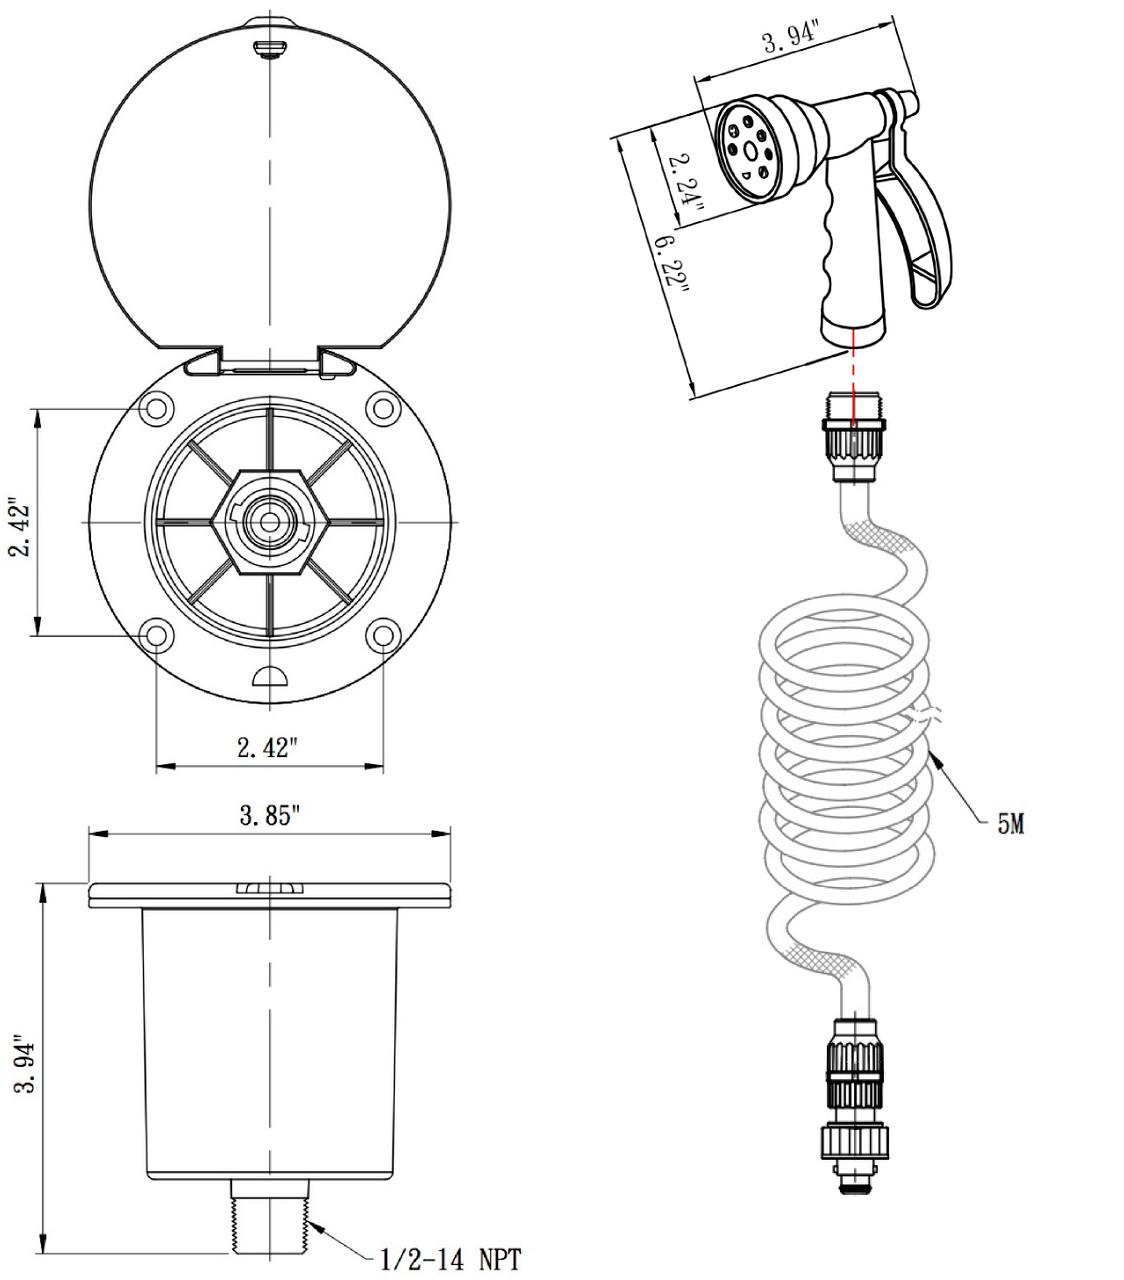 DF-SA188-WT and Utility Spray Dock Kit Hose RV Exterior Quick Connect Sprayer Dura Faucet White